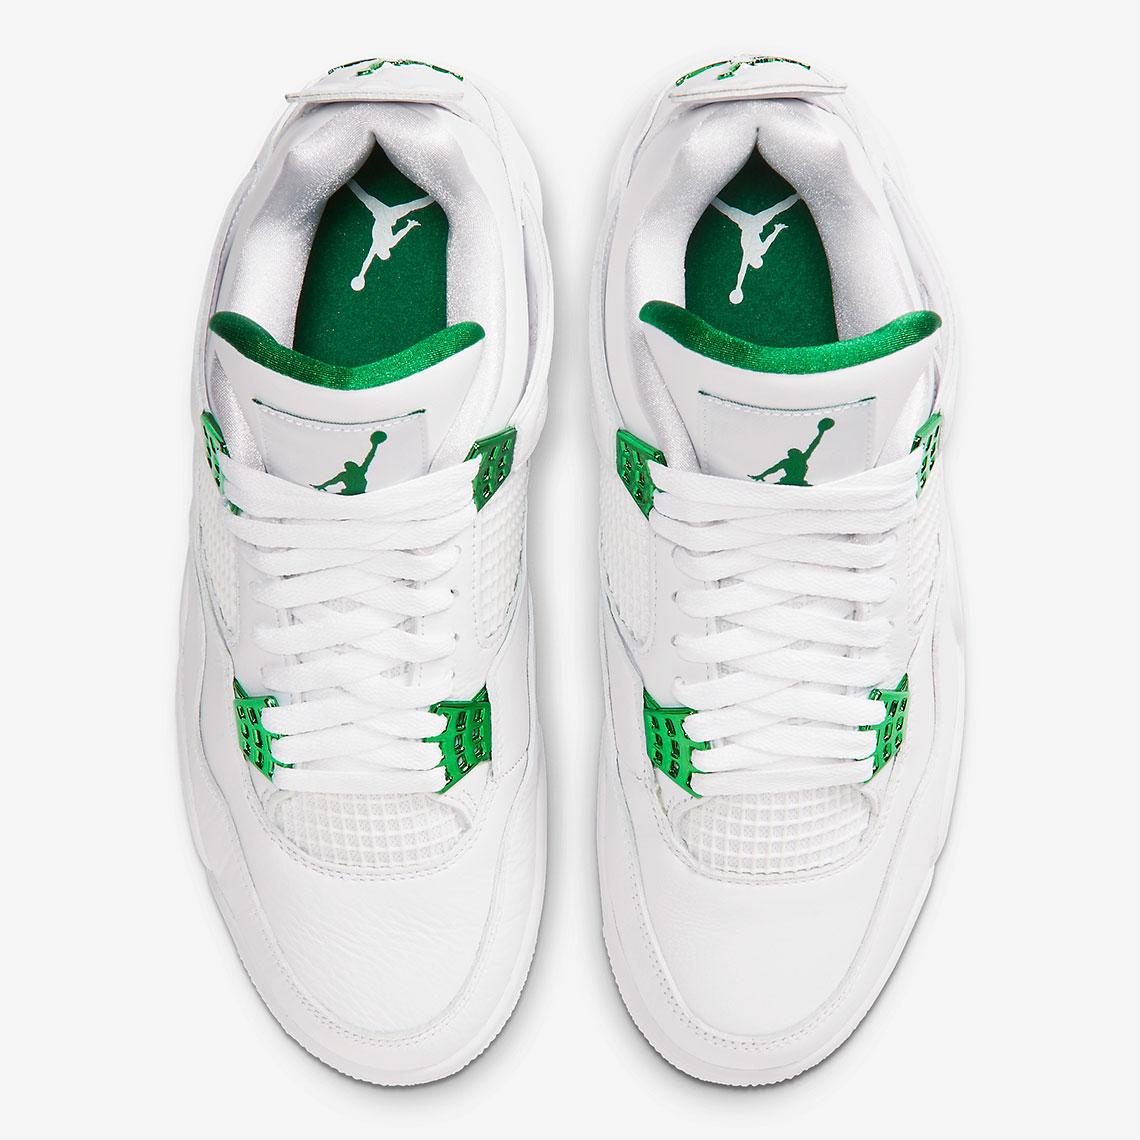 air-jordan-4-metallic-green-4